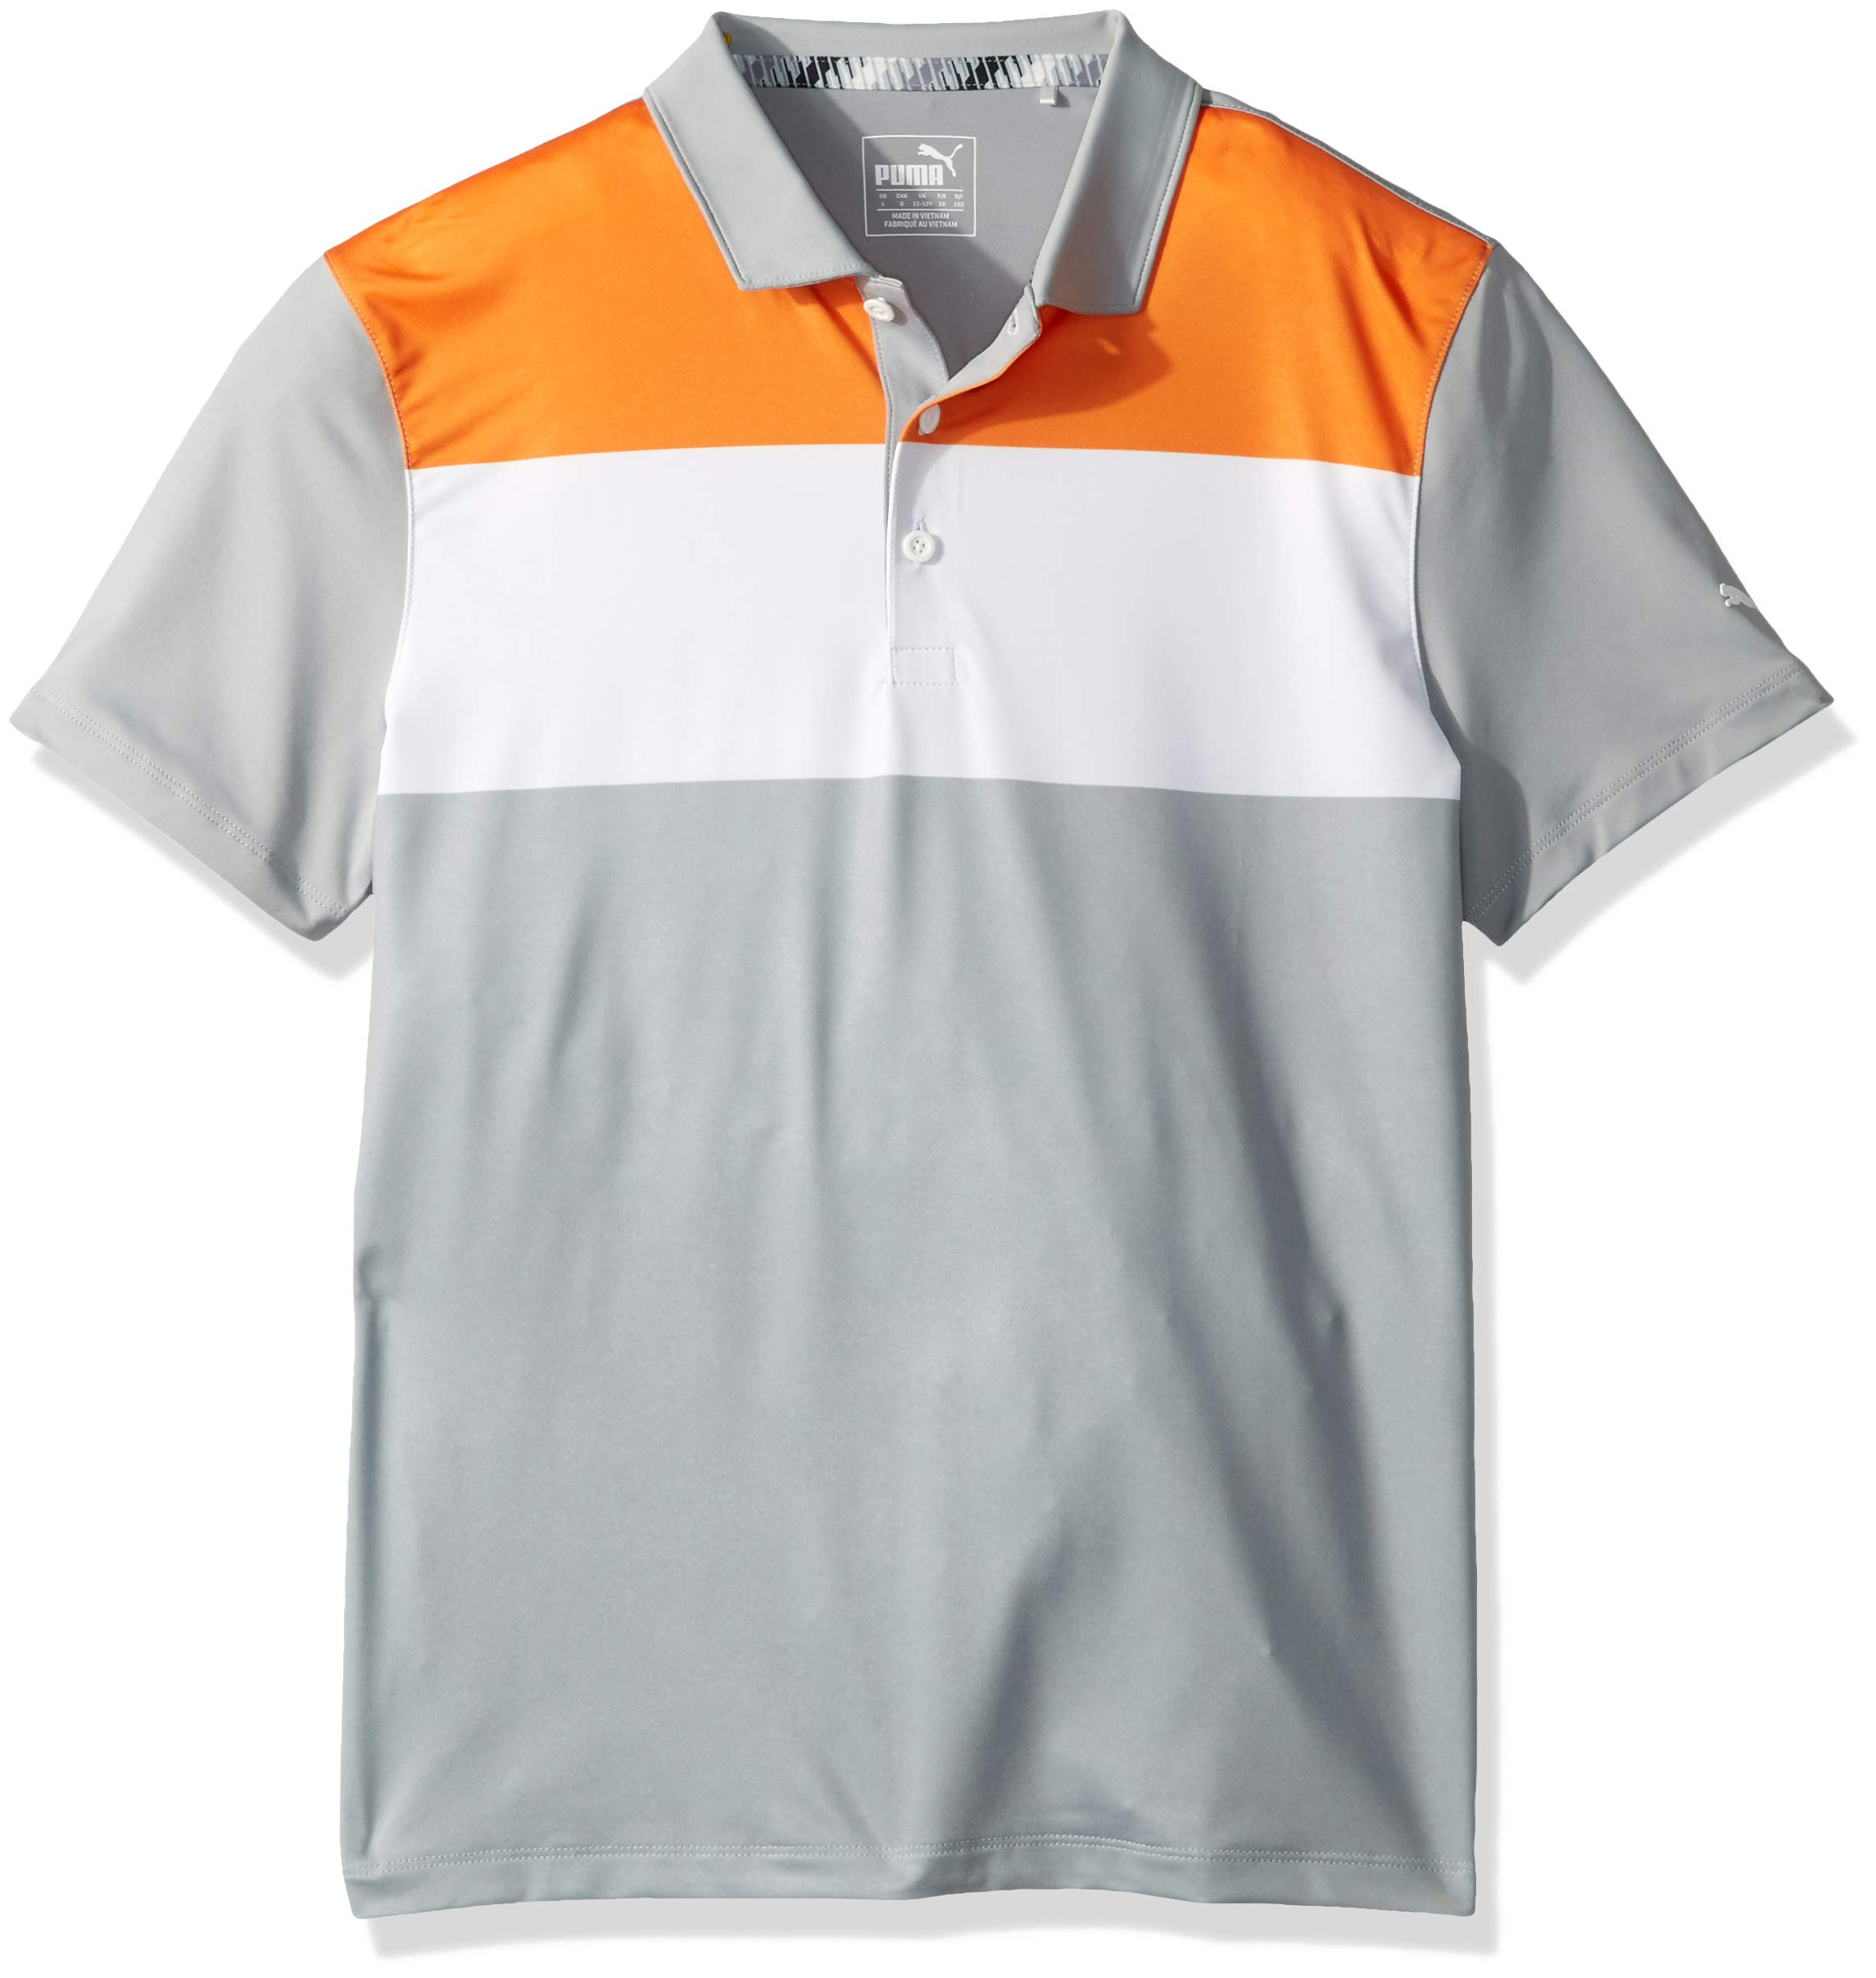 Puma Golf Boys 2019 Nineties Polo, Vibrant Orange-Quarry, x Large by PUMA